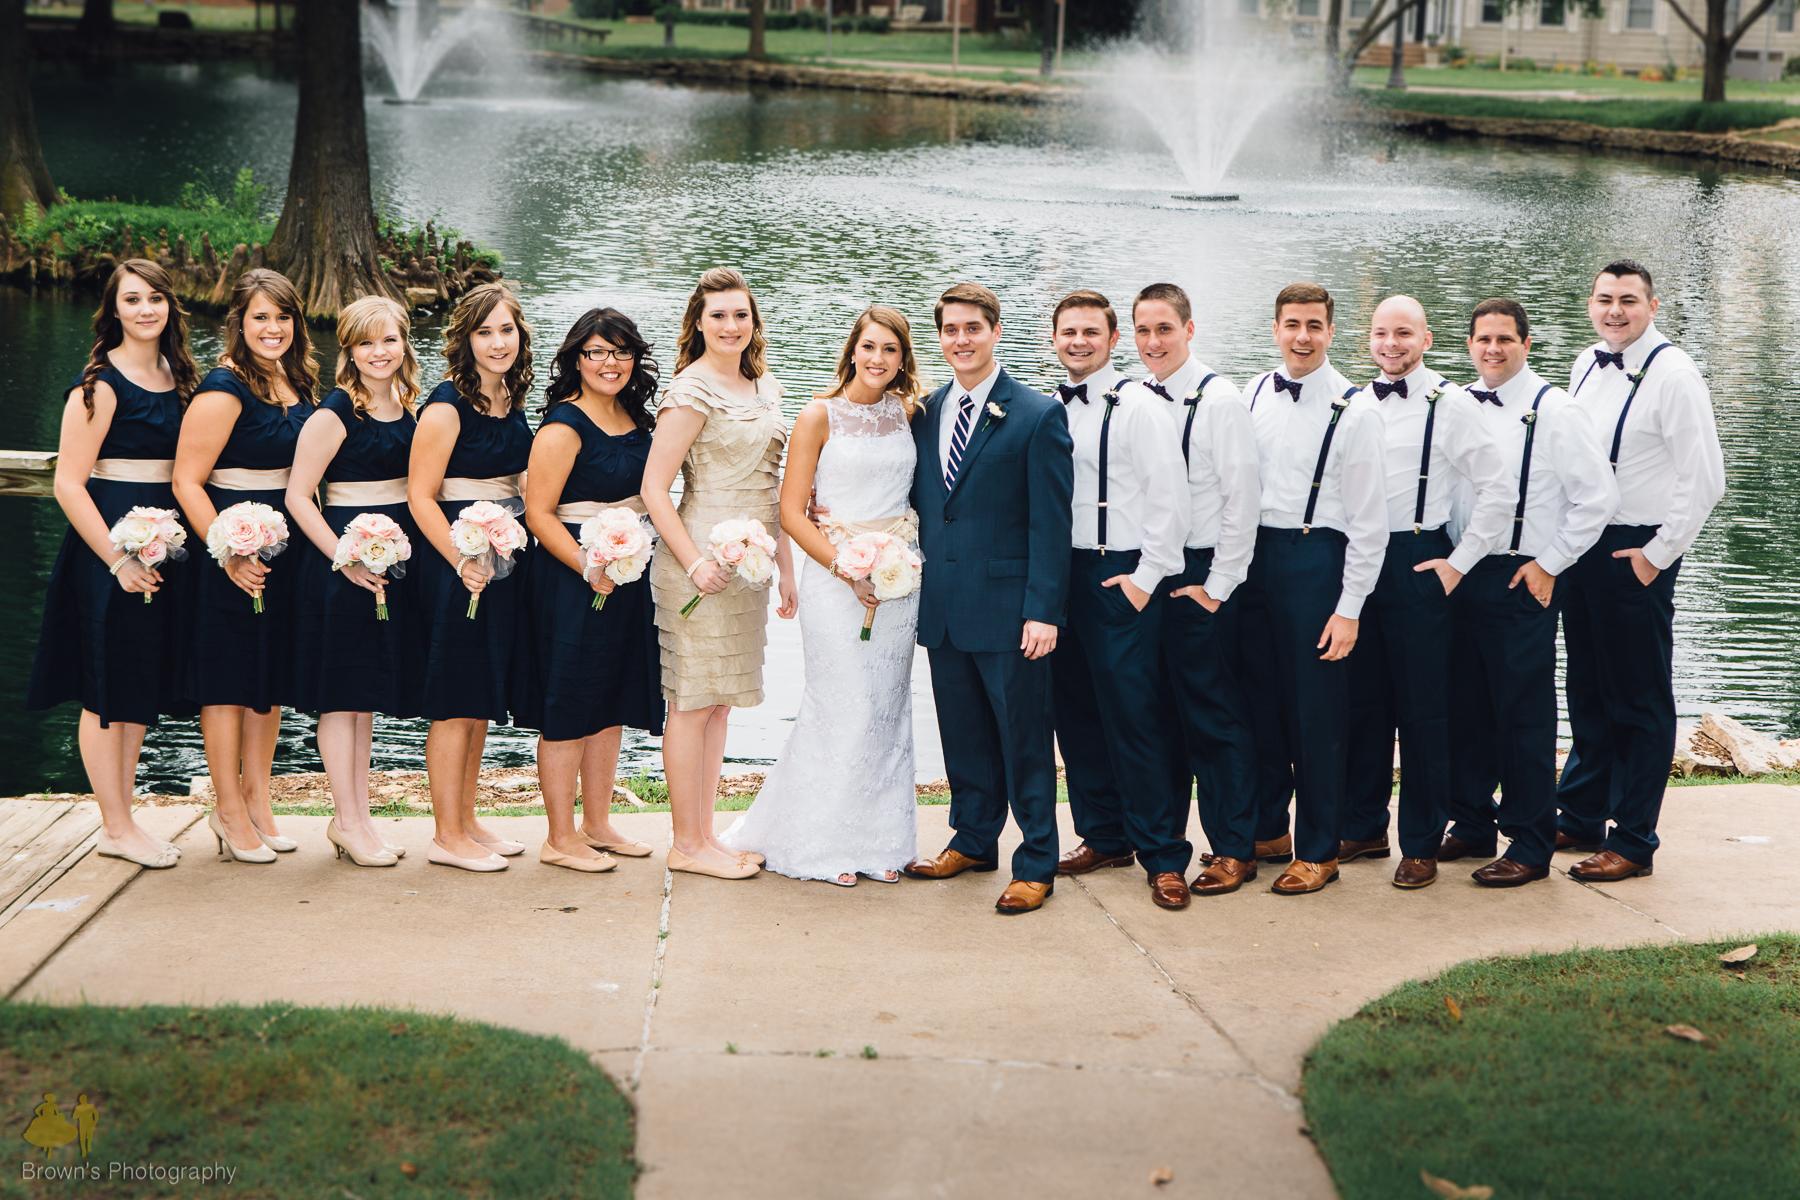 stillwater-wedding-photographer-1.jpg